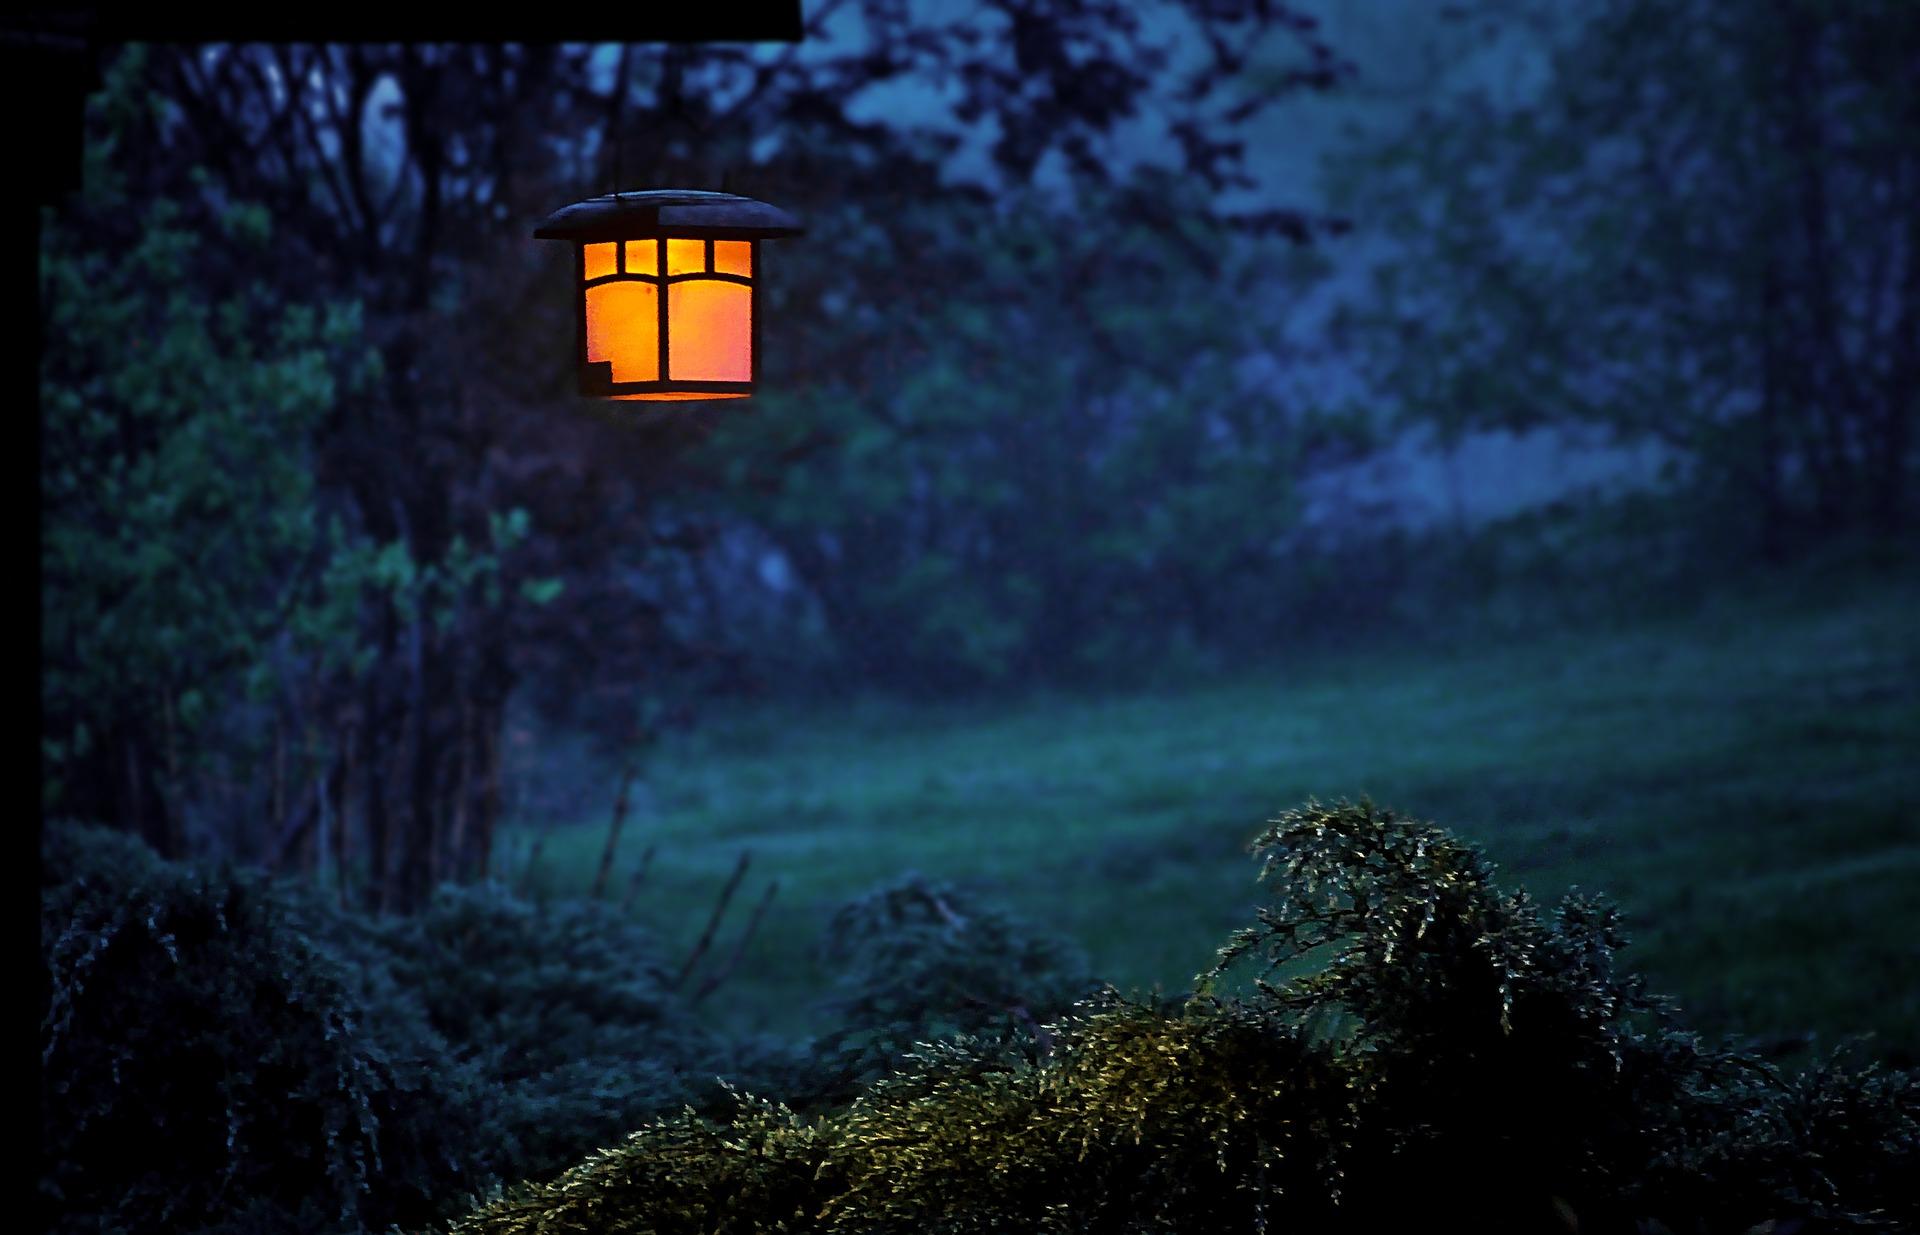 twilight-2291361_1920